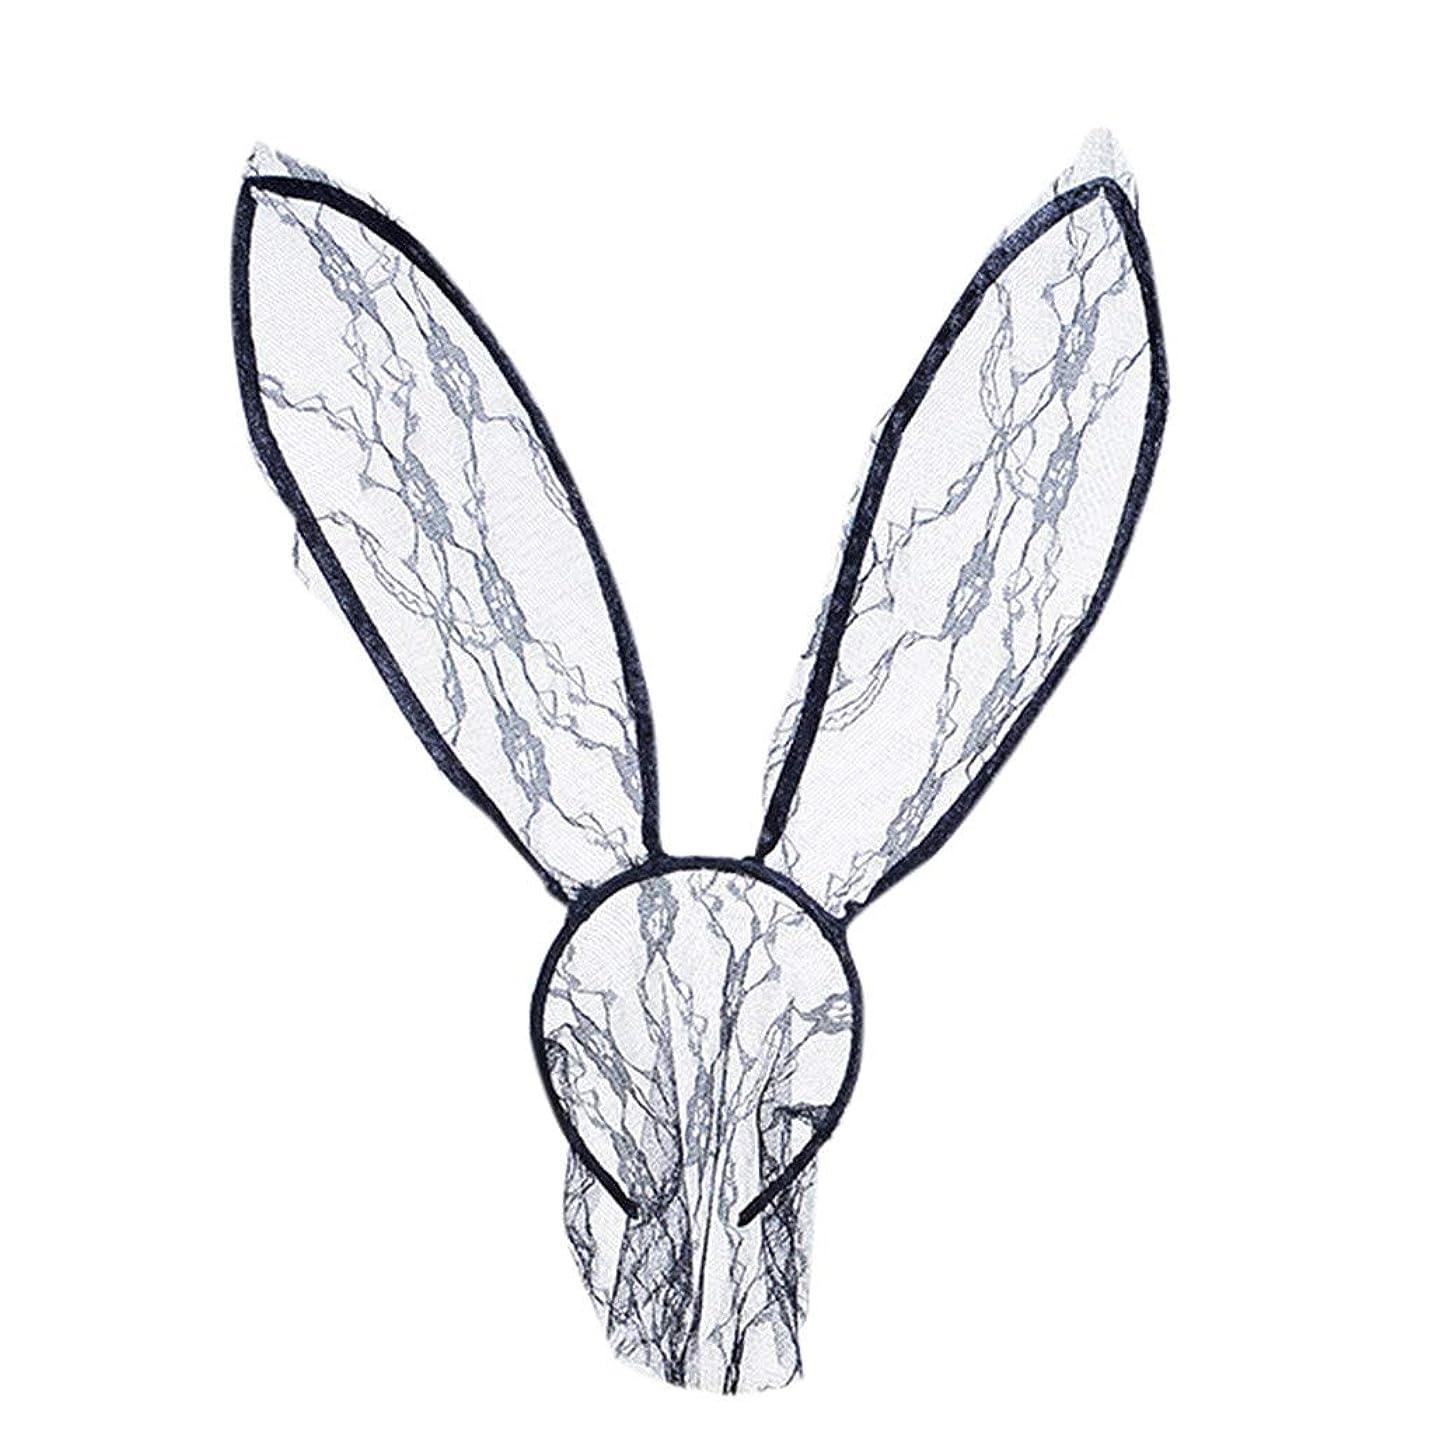 Lieteuy ハロウィン 仮装 ヘッドバンド ヘアバンド チュール うさぎの耳 カチューム パーティー 髪まとめグッズ コスプレグッズ レディースヘッドバンド カチューシャ ヘアアクセサリー 可愛い